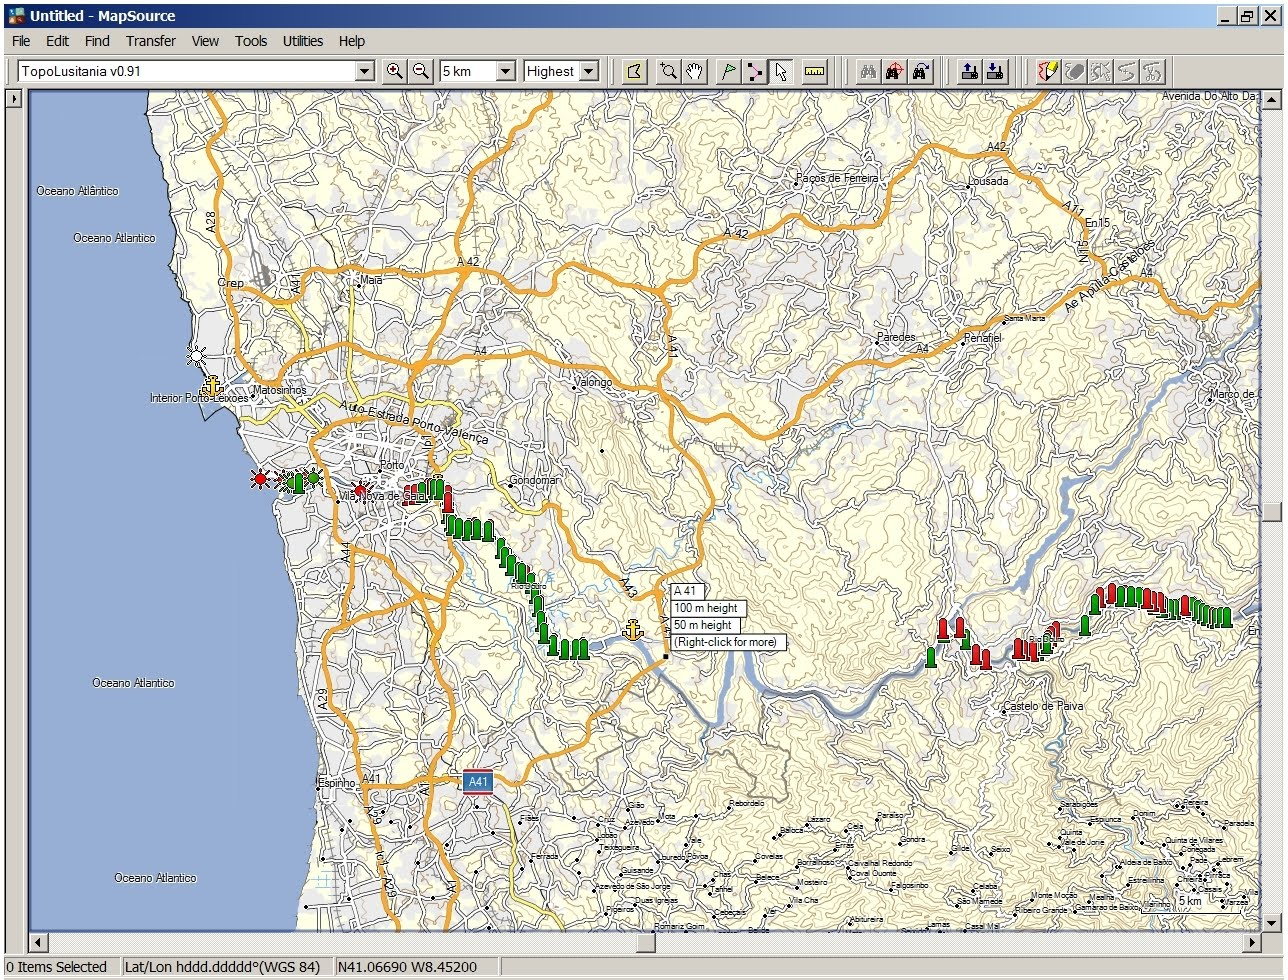 circular regional exterior do porto mapa TopoLusitania   Mapa Topográfico de Portugal para GPS em formato  circular regional exterior do porto mapa